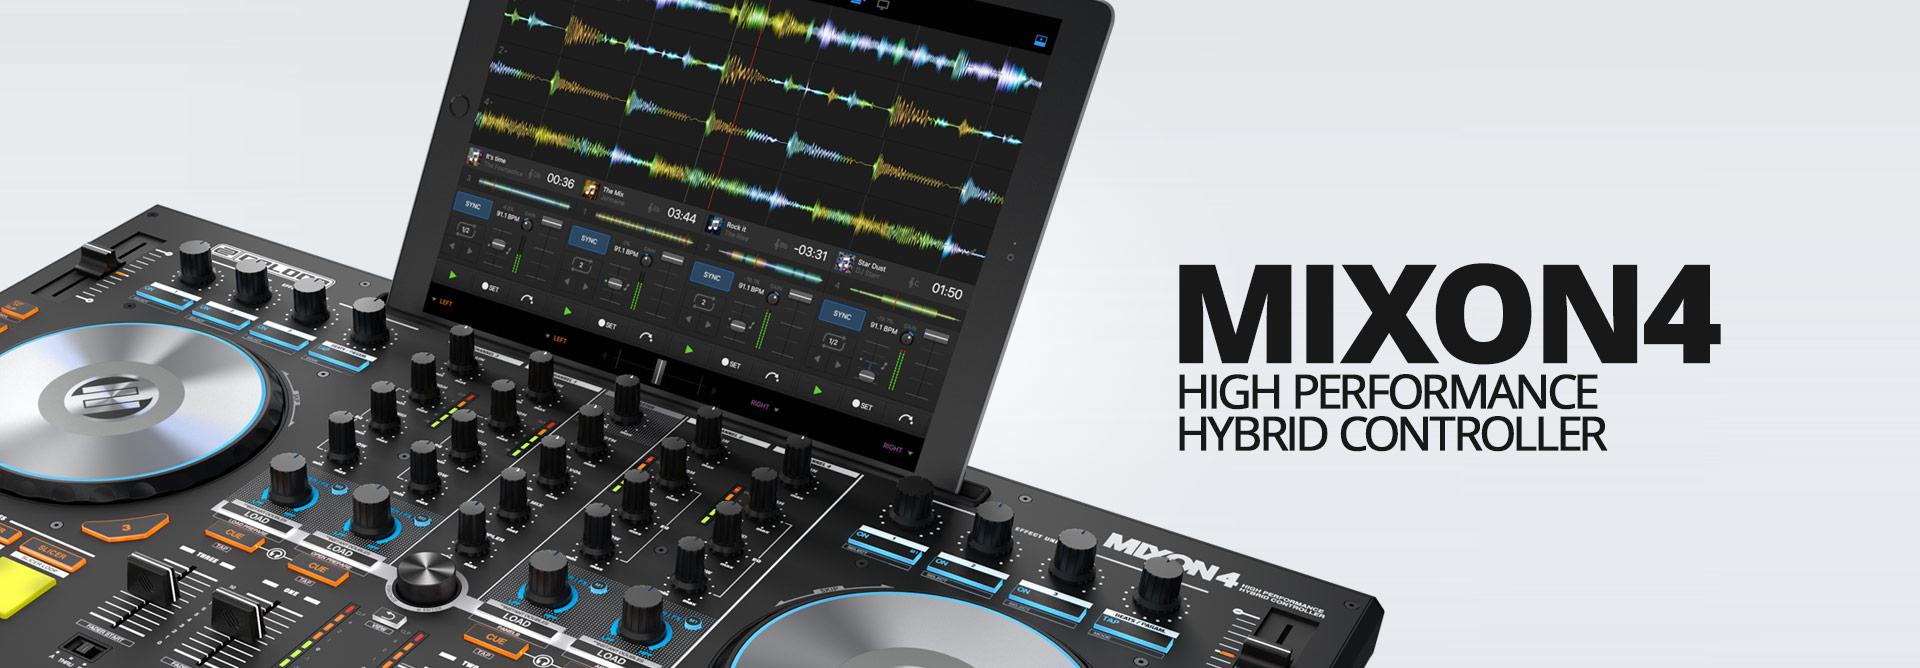 Reloop Mixon 4 - Header Image